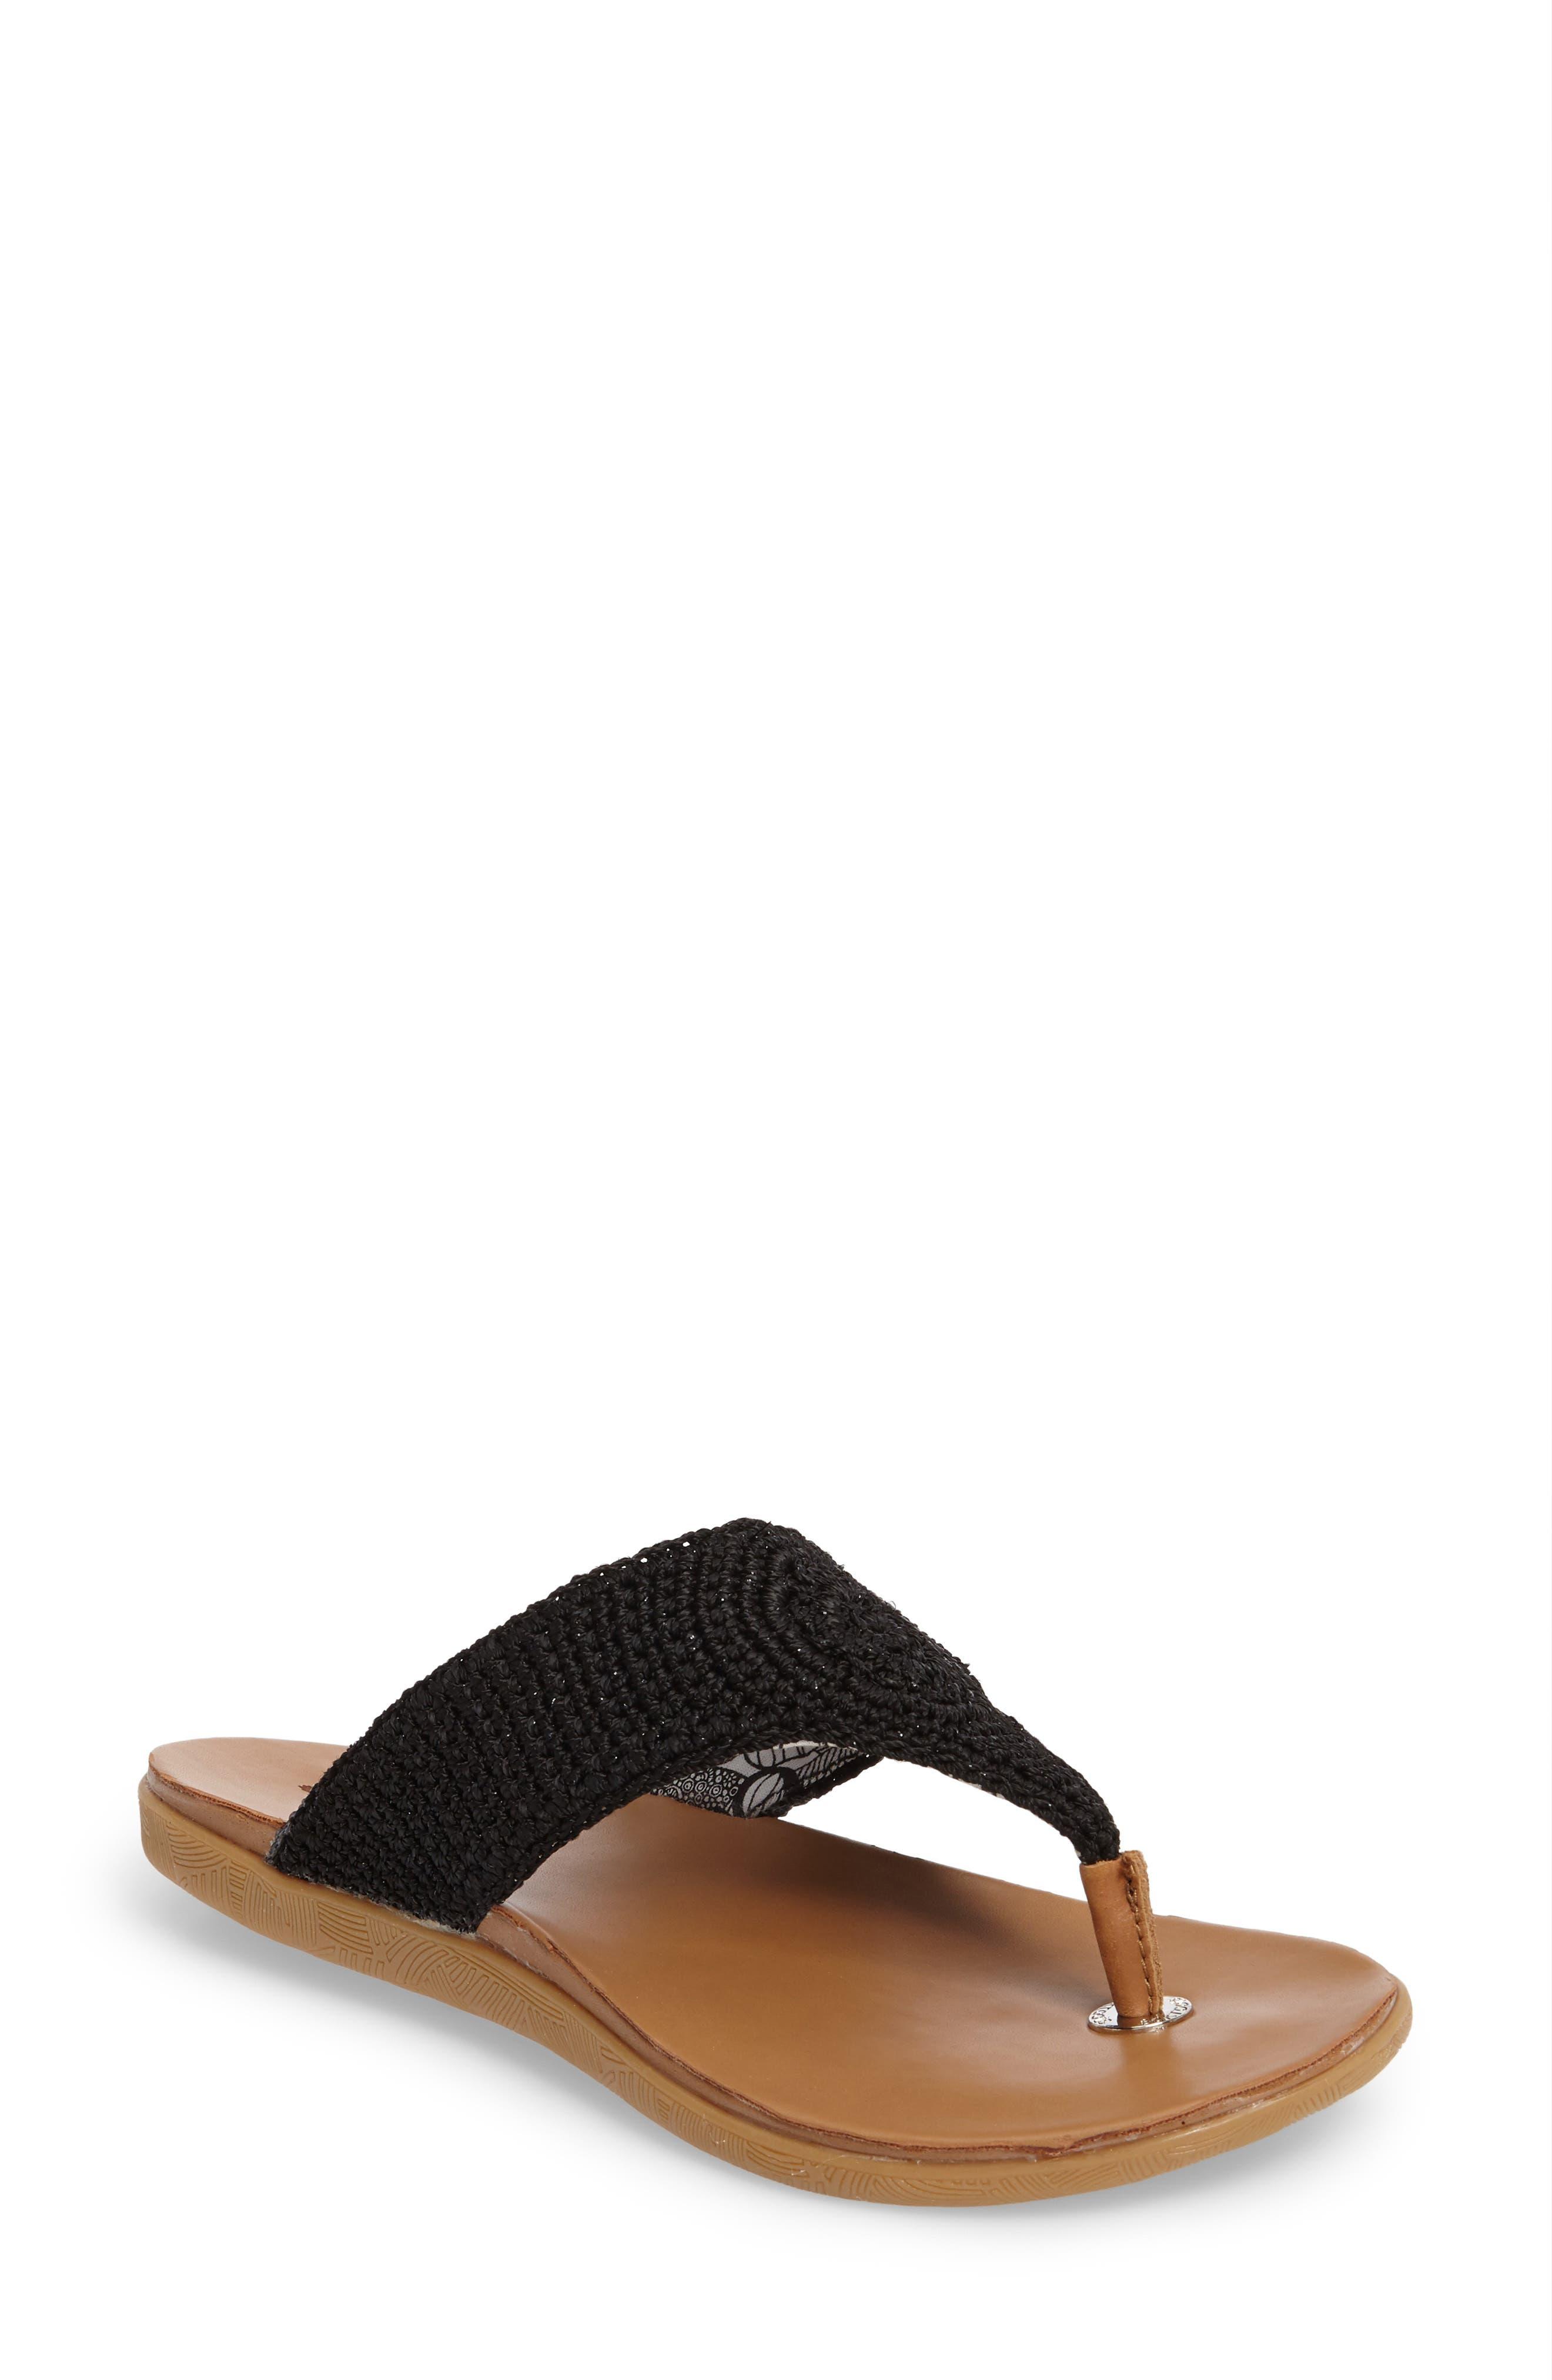 Sarria Flip Flop,                         Main,                         color, BLACK SPARKLE FABRIC